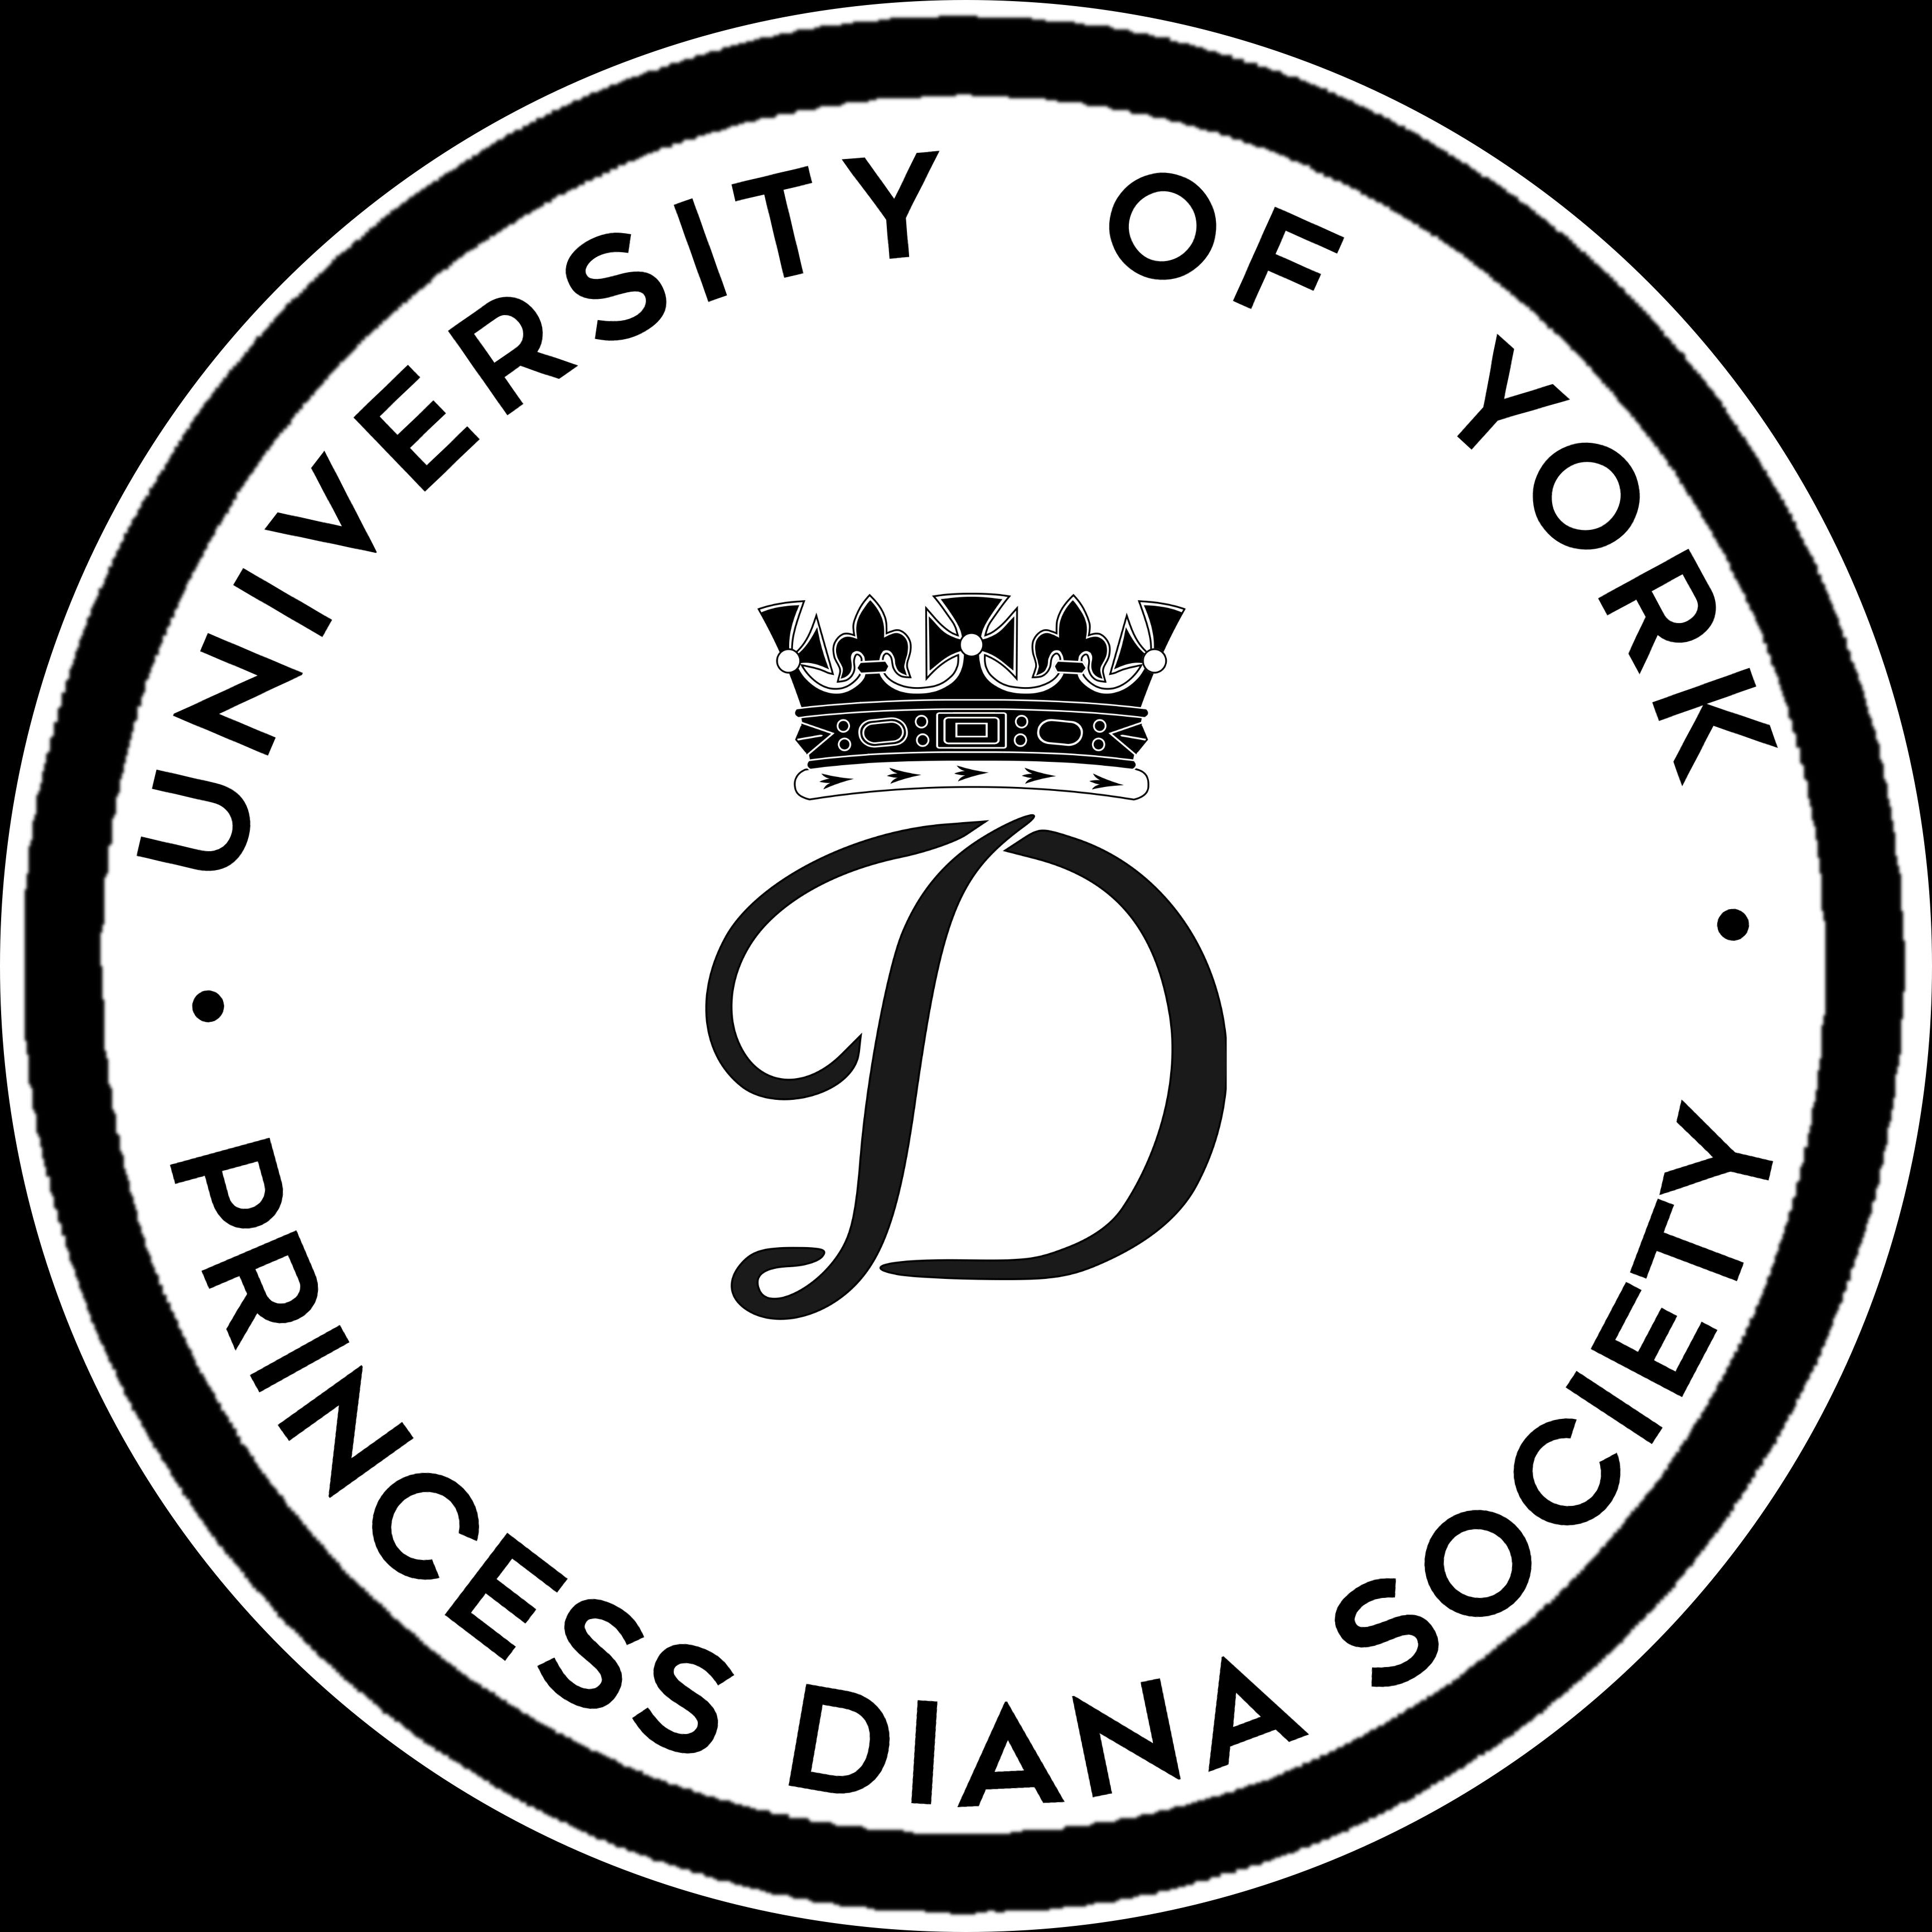 Princess Diana Society